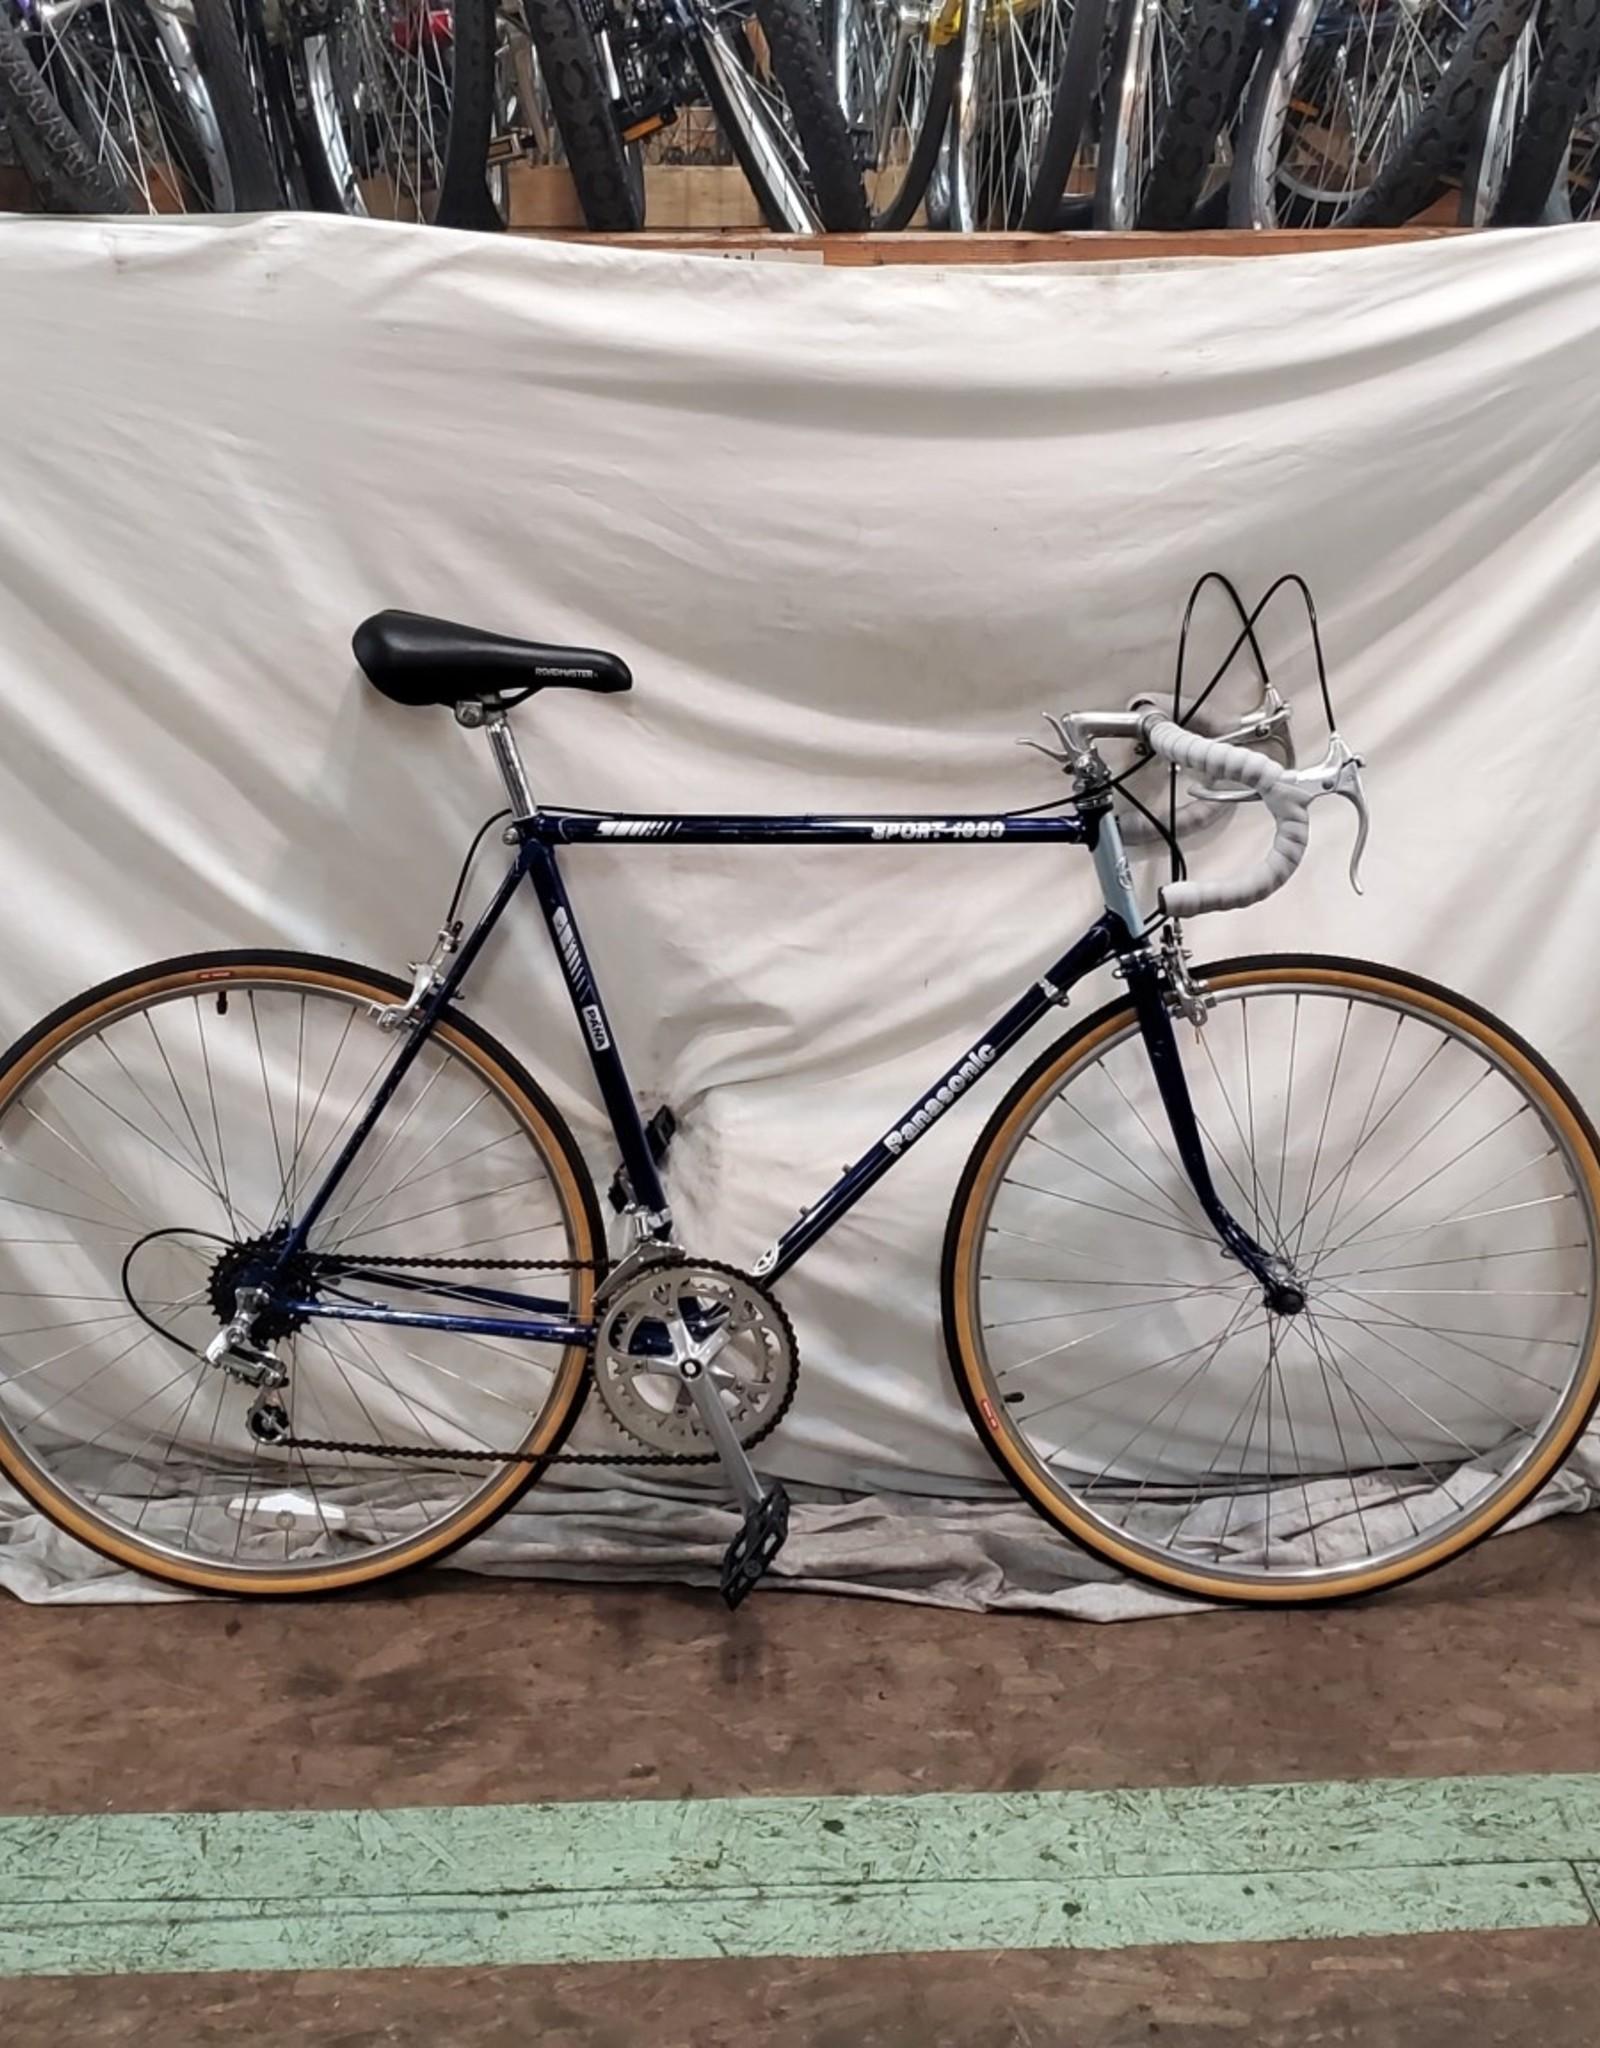 57cm Panasonic Sport-1000 (0790 A1L)